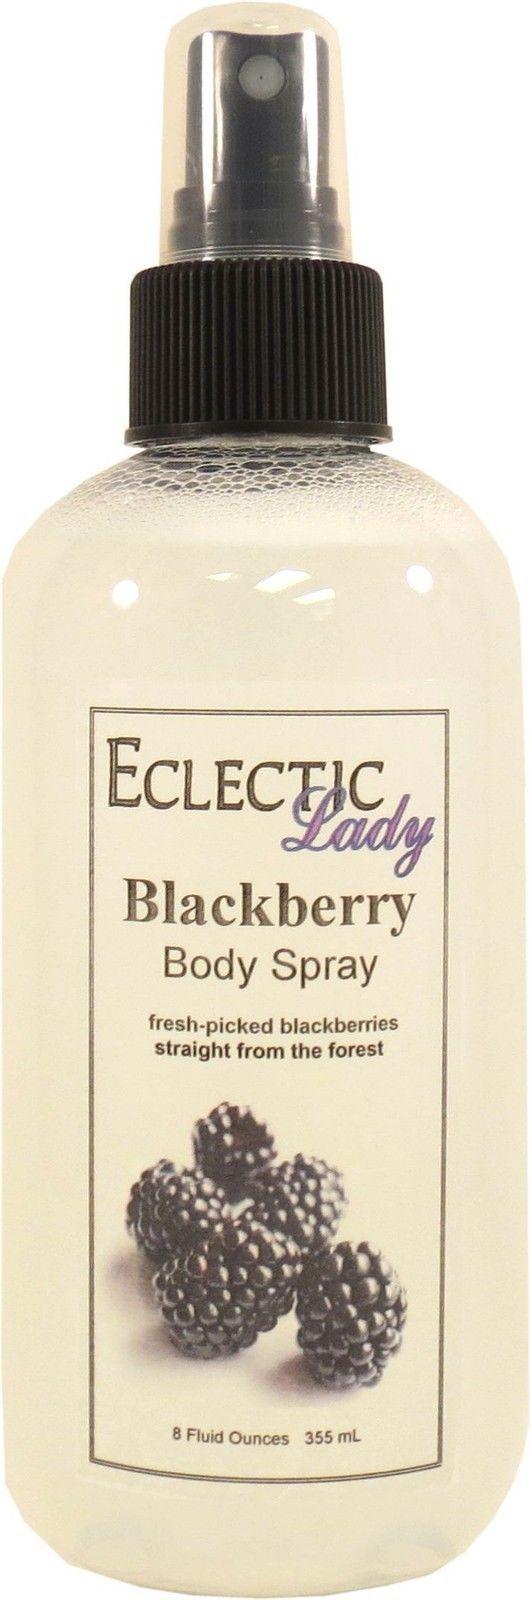 Blackberry Body Spray